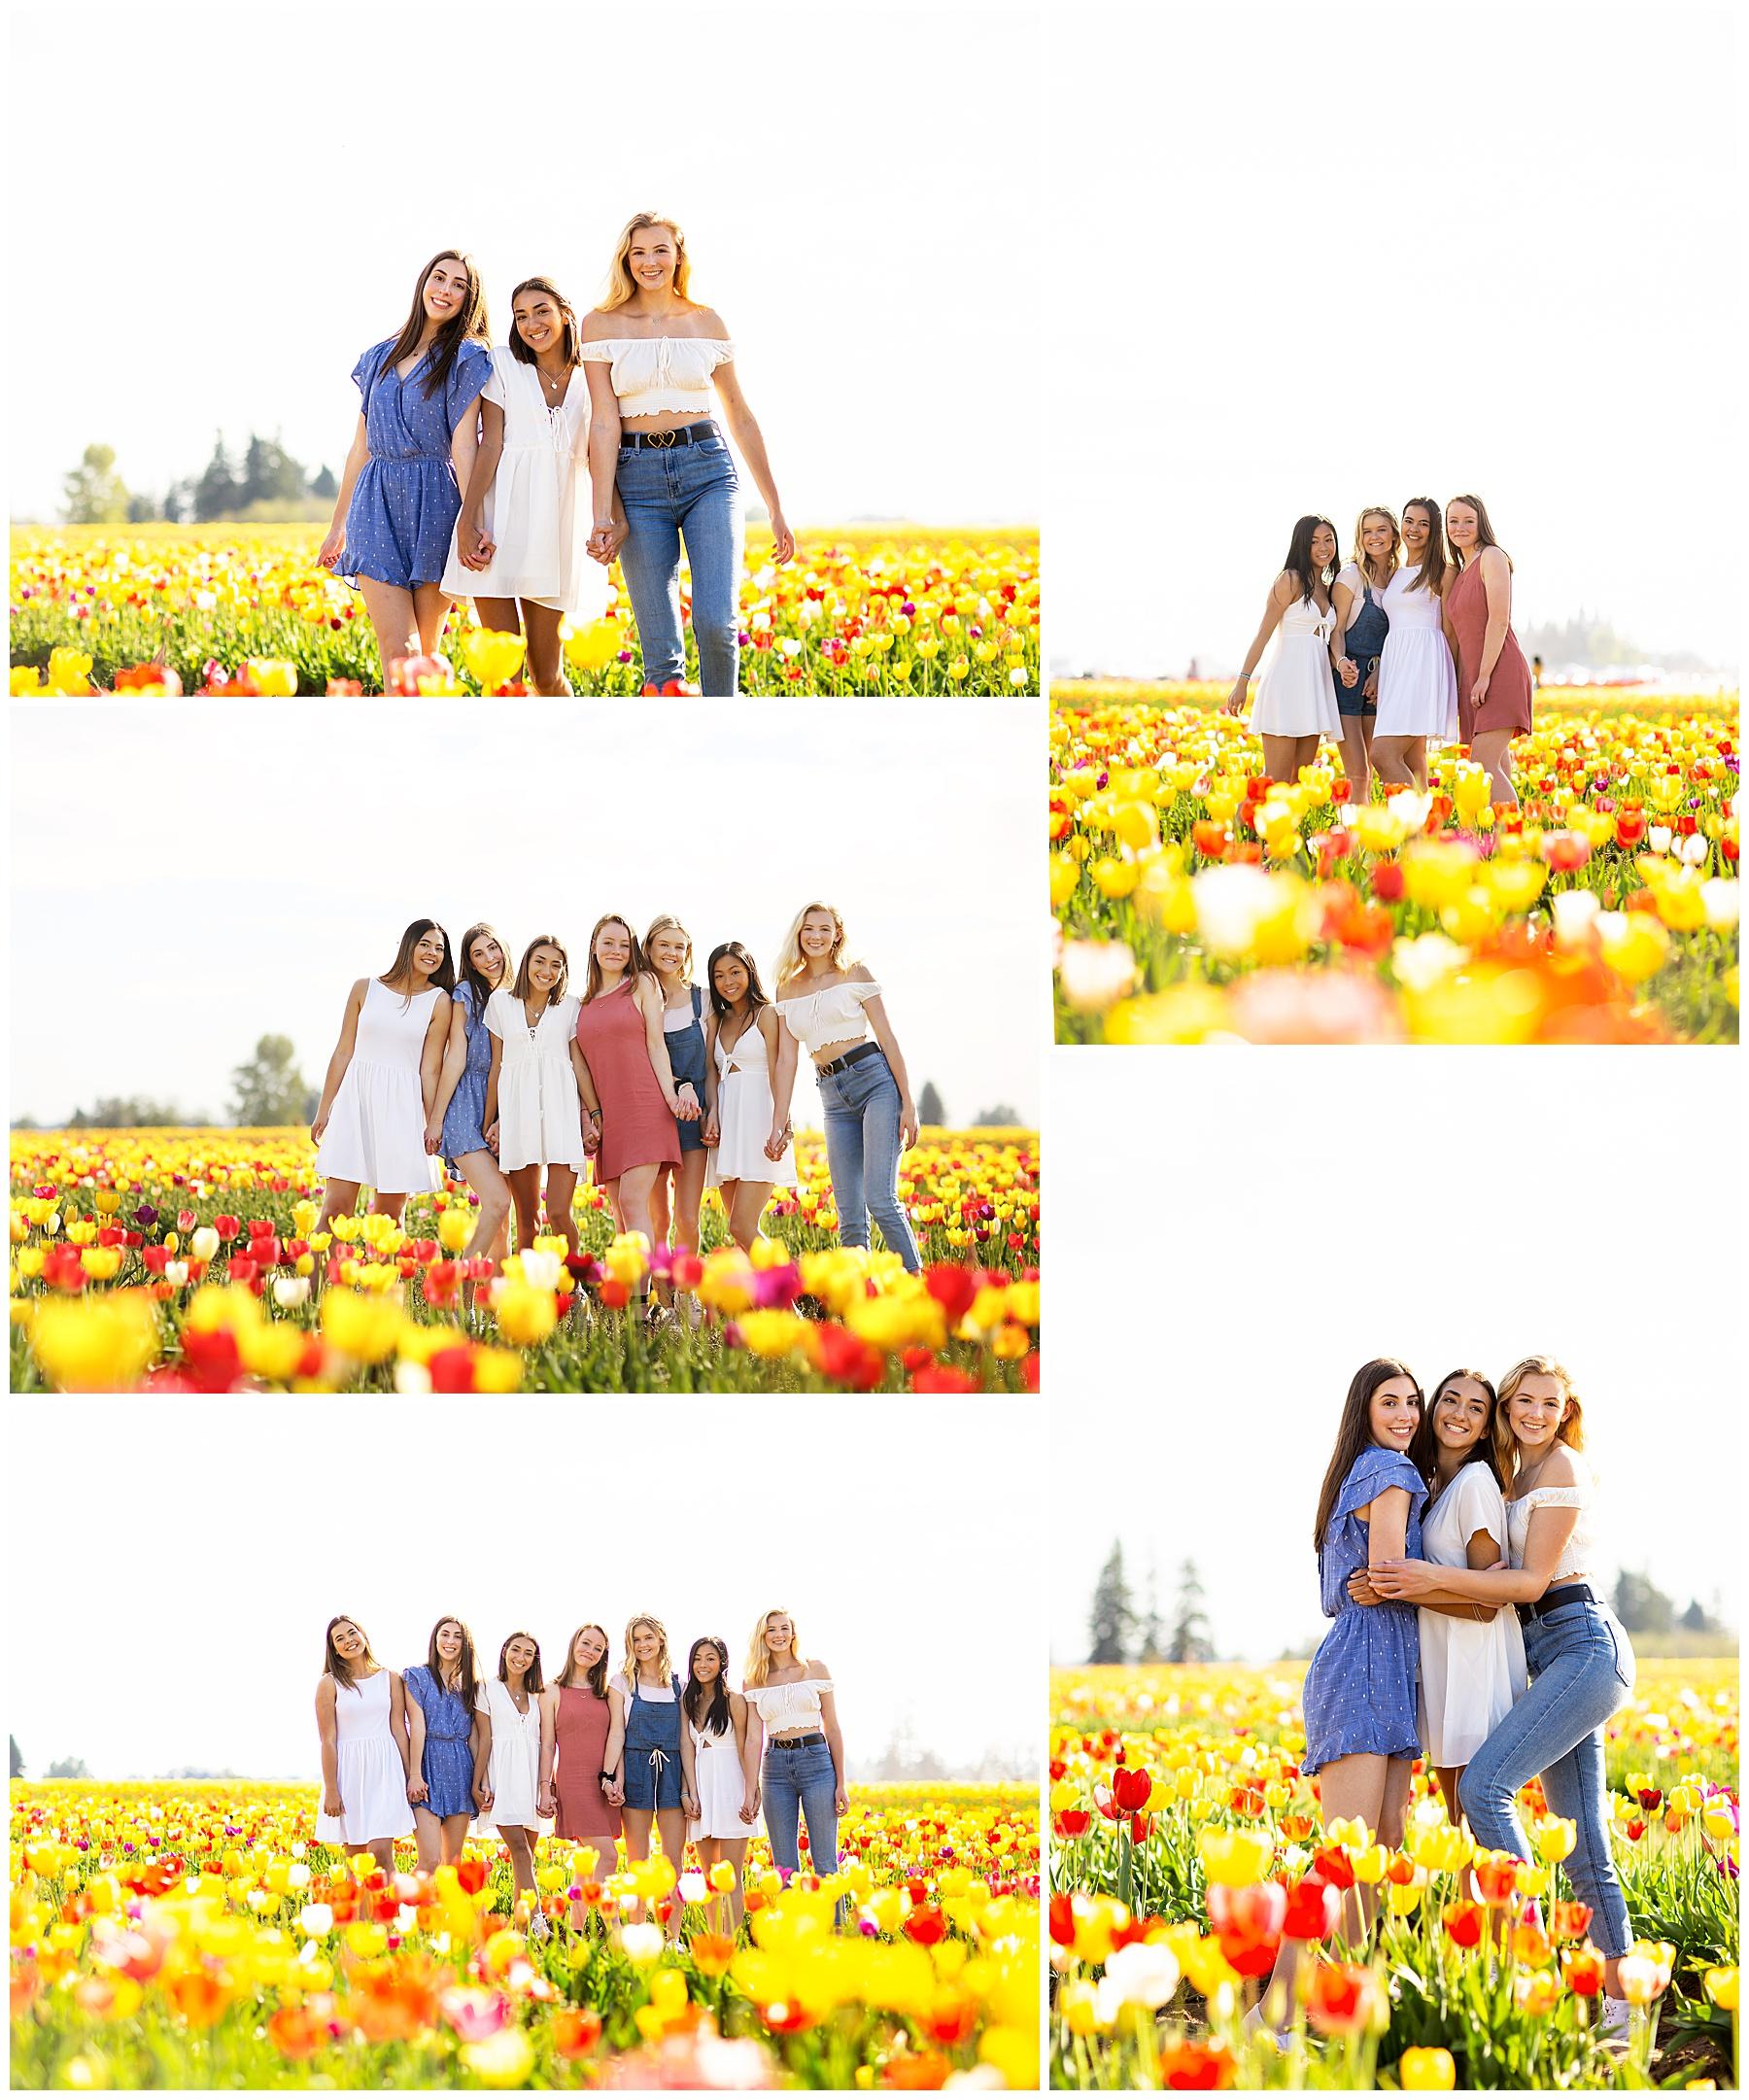 senior photos at the tulip festival 2019 OR 1.jpg